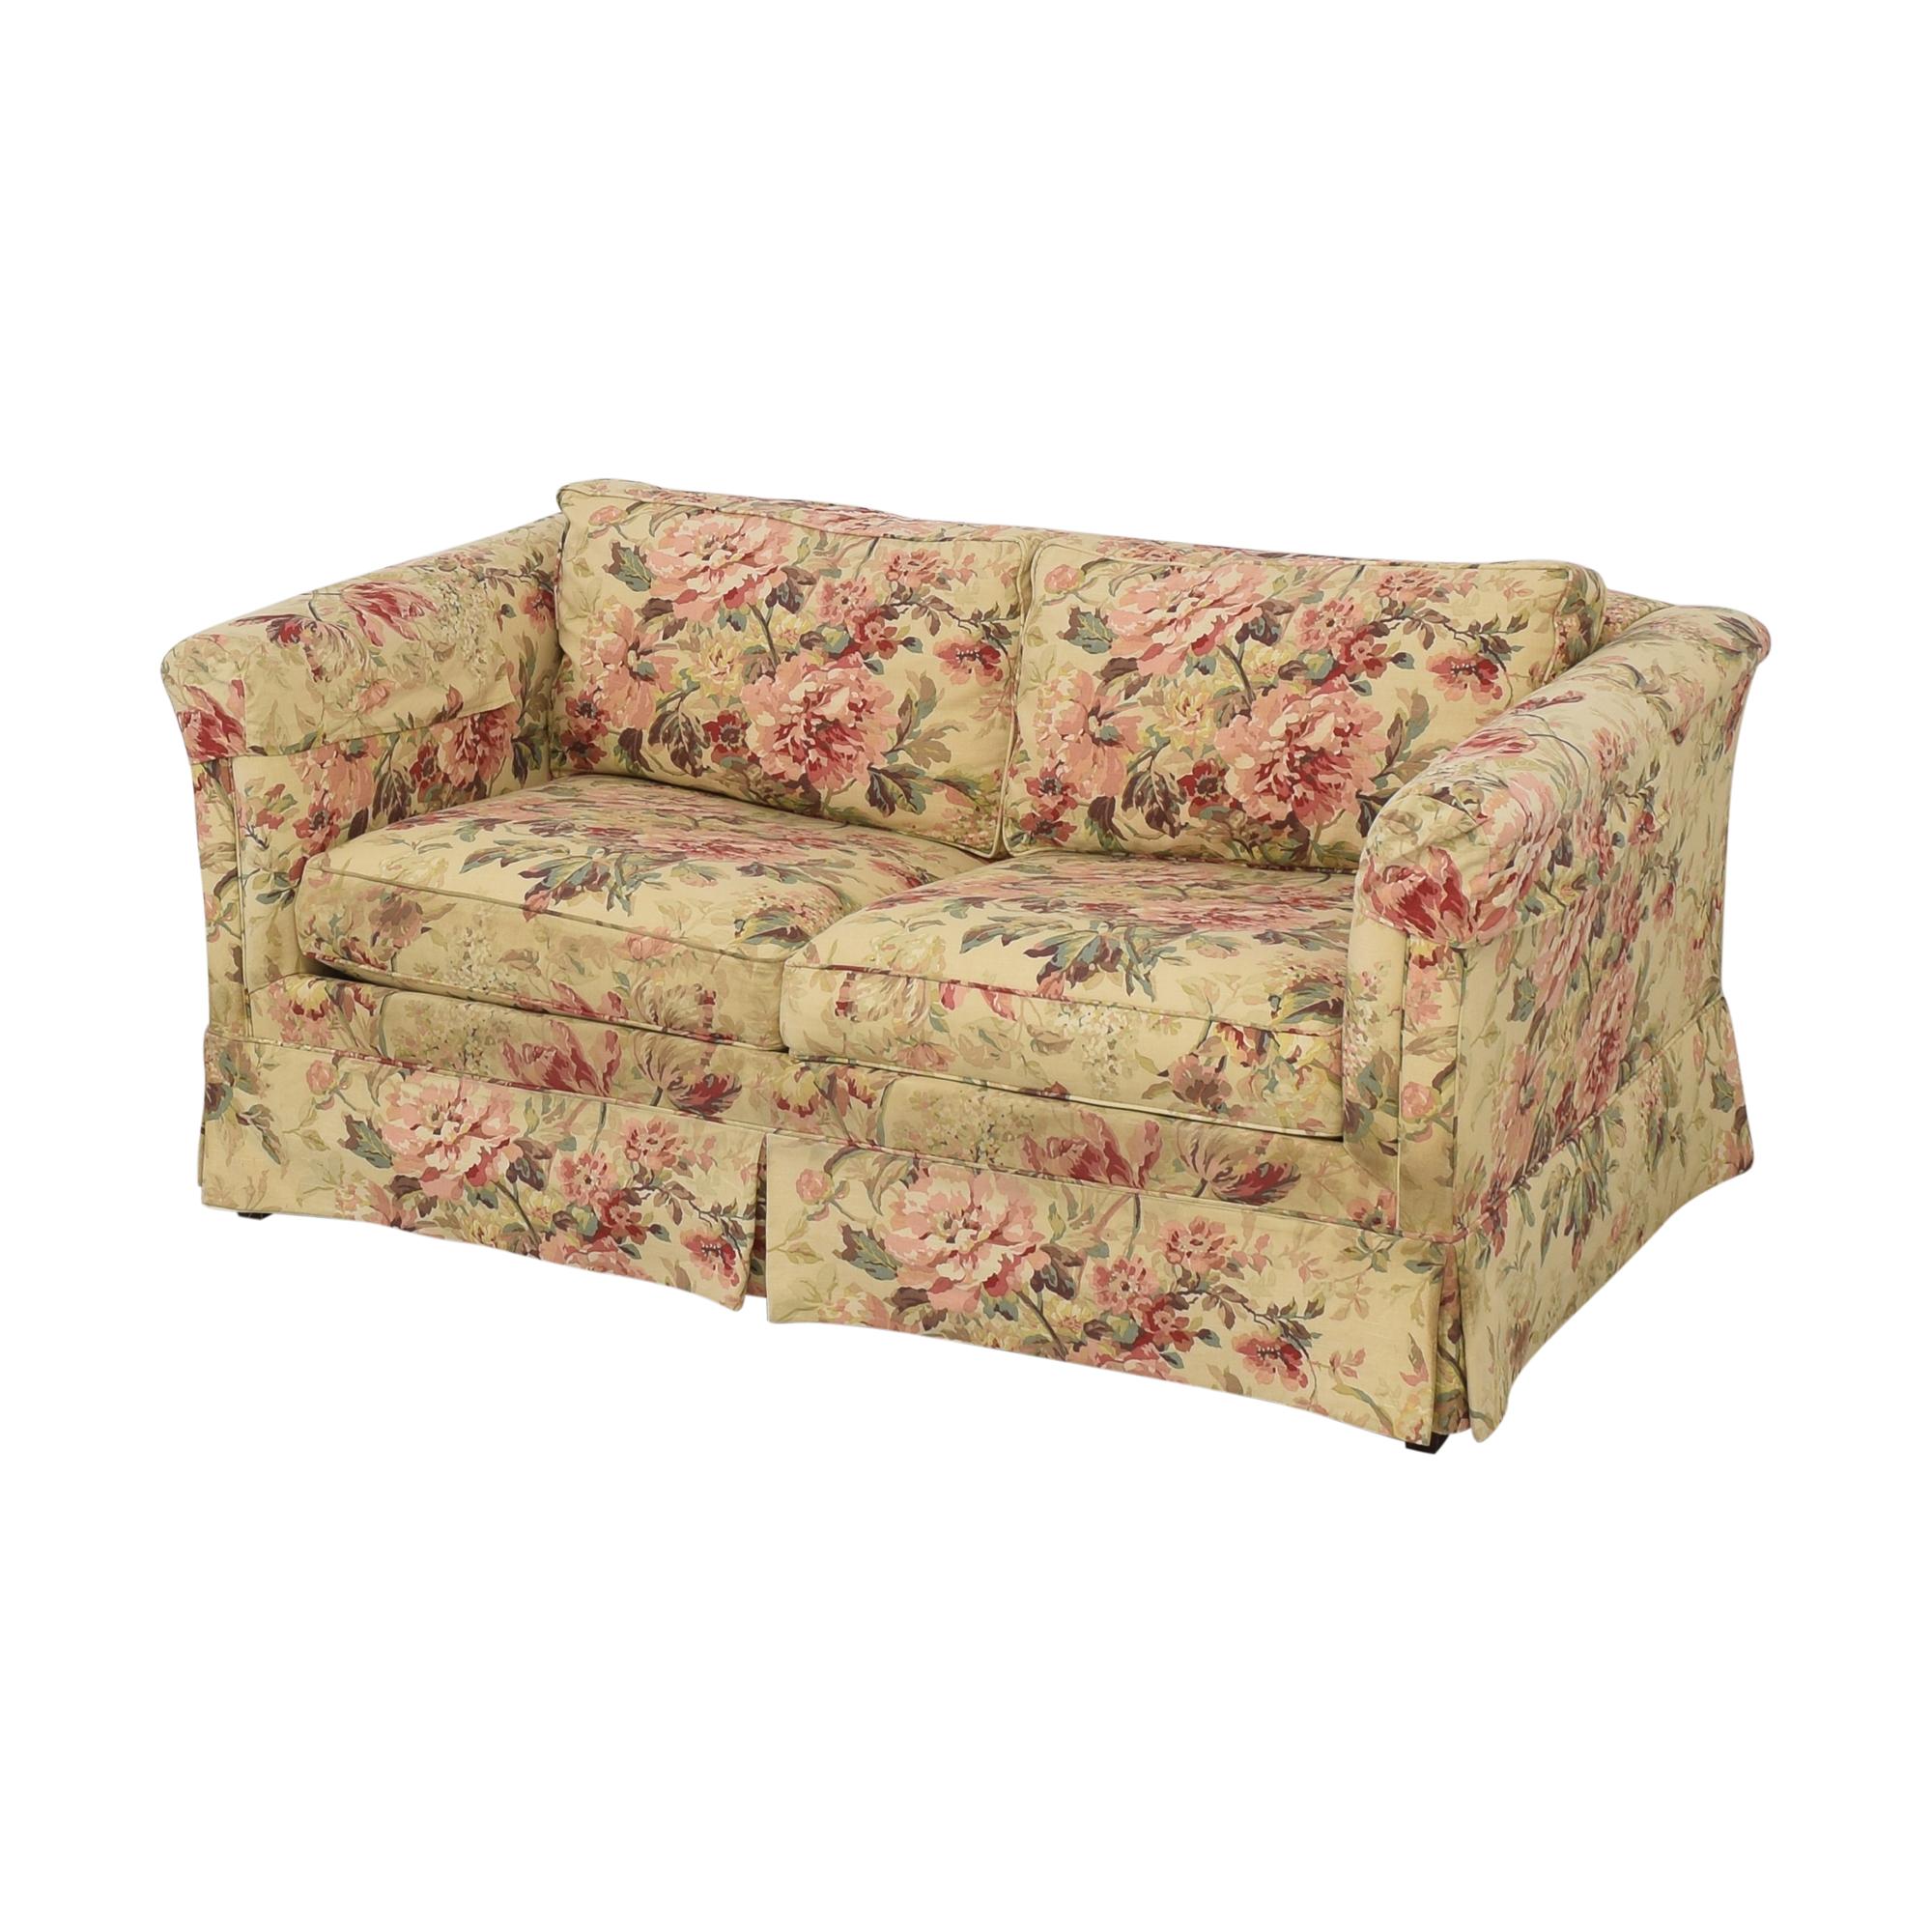 William Alan William Alan Loveseat Sleeper Sofa dimensions